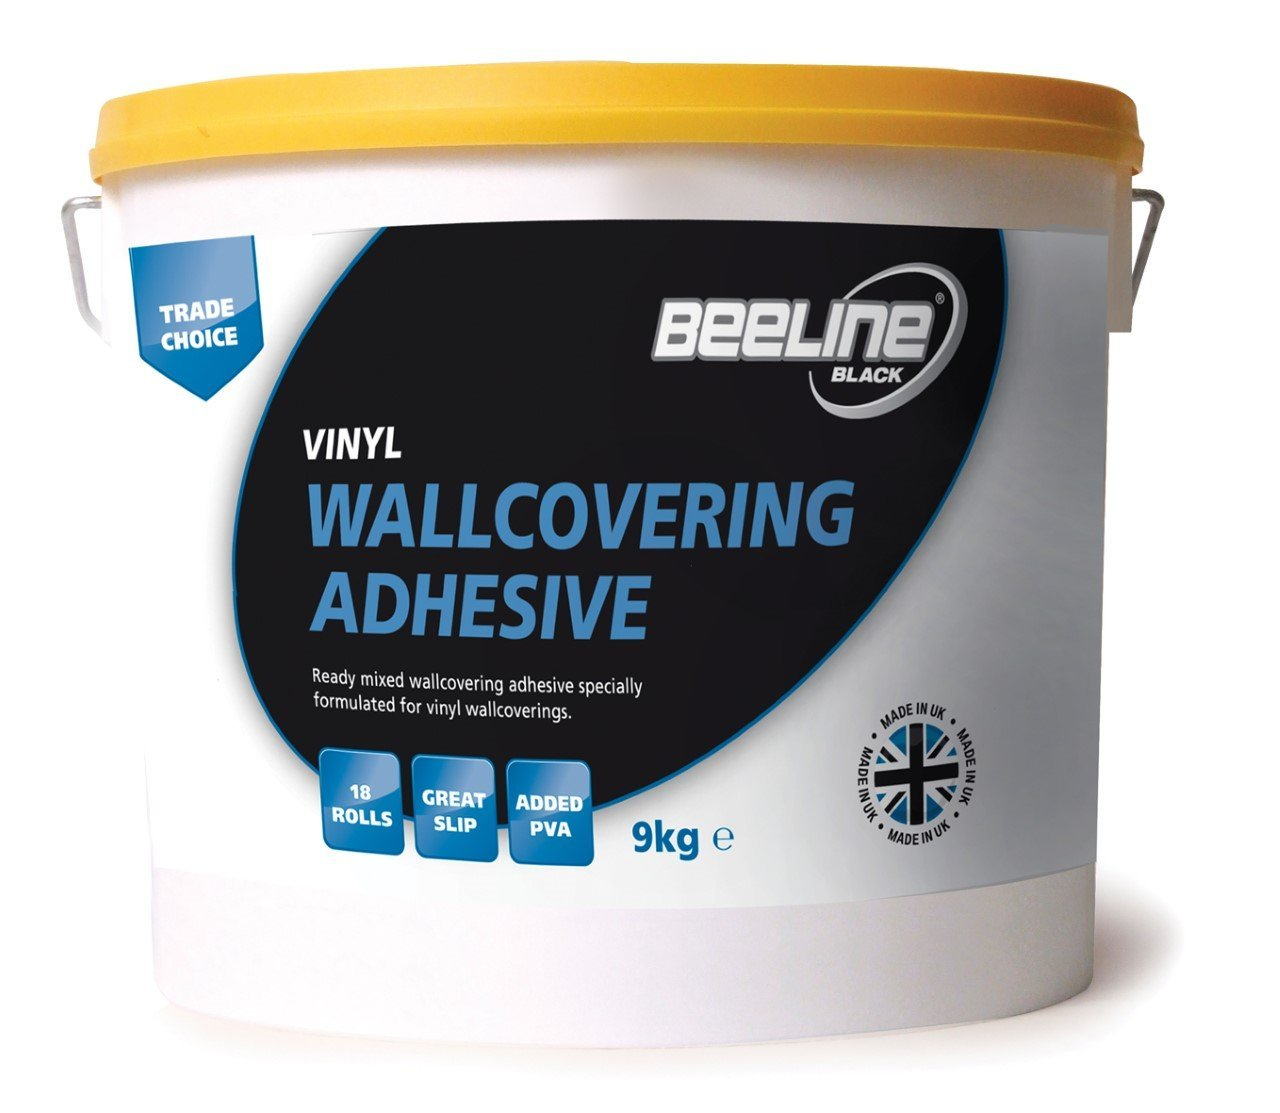 Halls Beeline Vinyl Wallcovering Adhesive